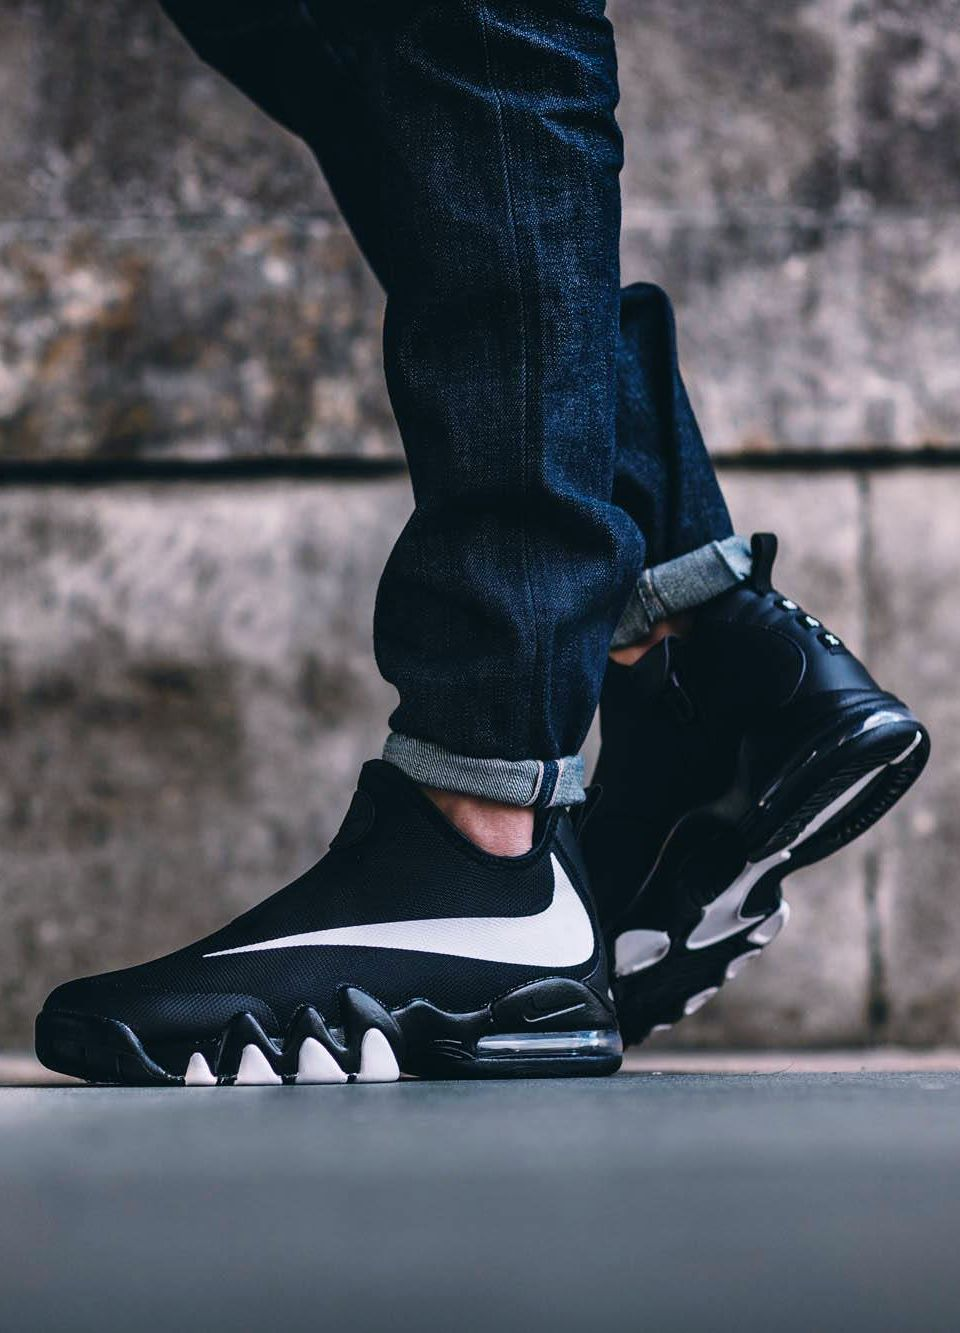 b078318785 Nike Big Swoosh (via Kicks-daily.com) | Shoe Envy | Sneakers, Nike ...